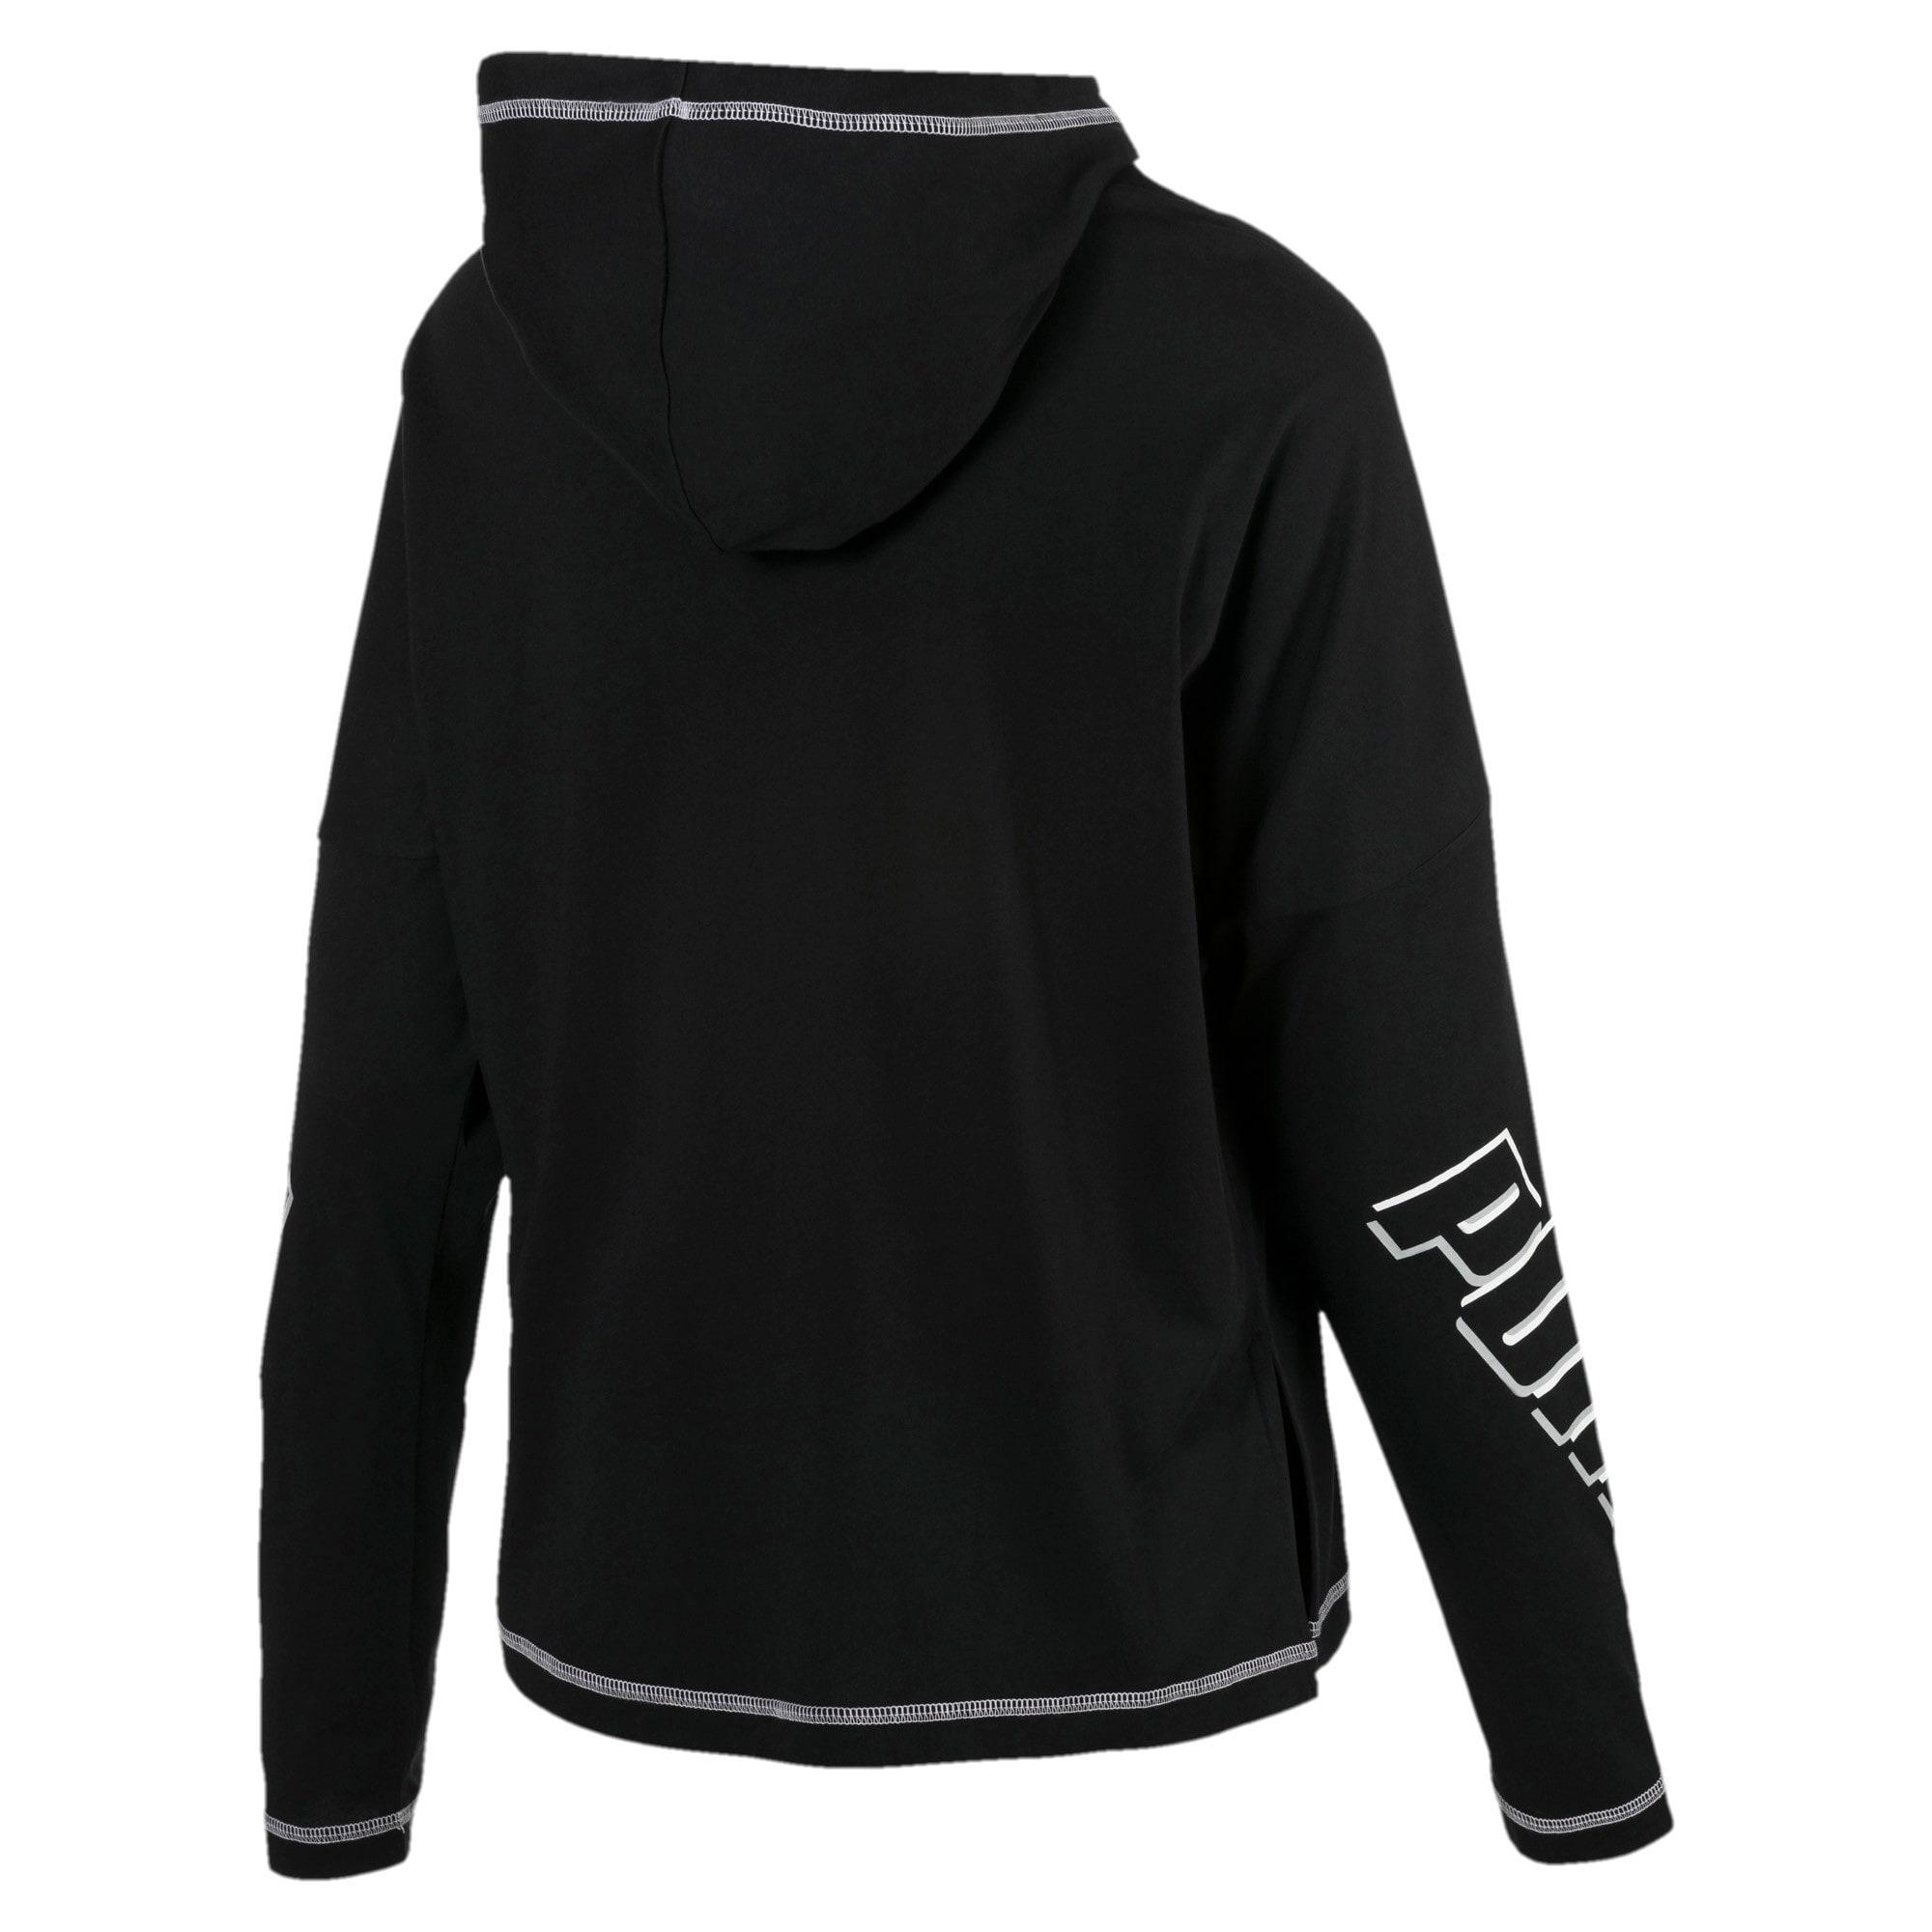 Miniatura 5 de Top liviano Modern Sports para mujer, Cotton Black, mediano